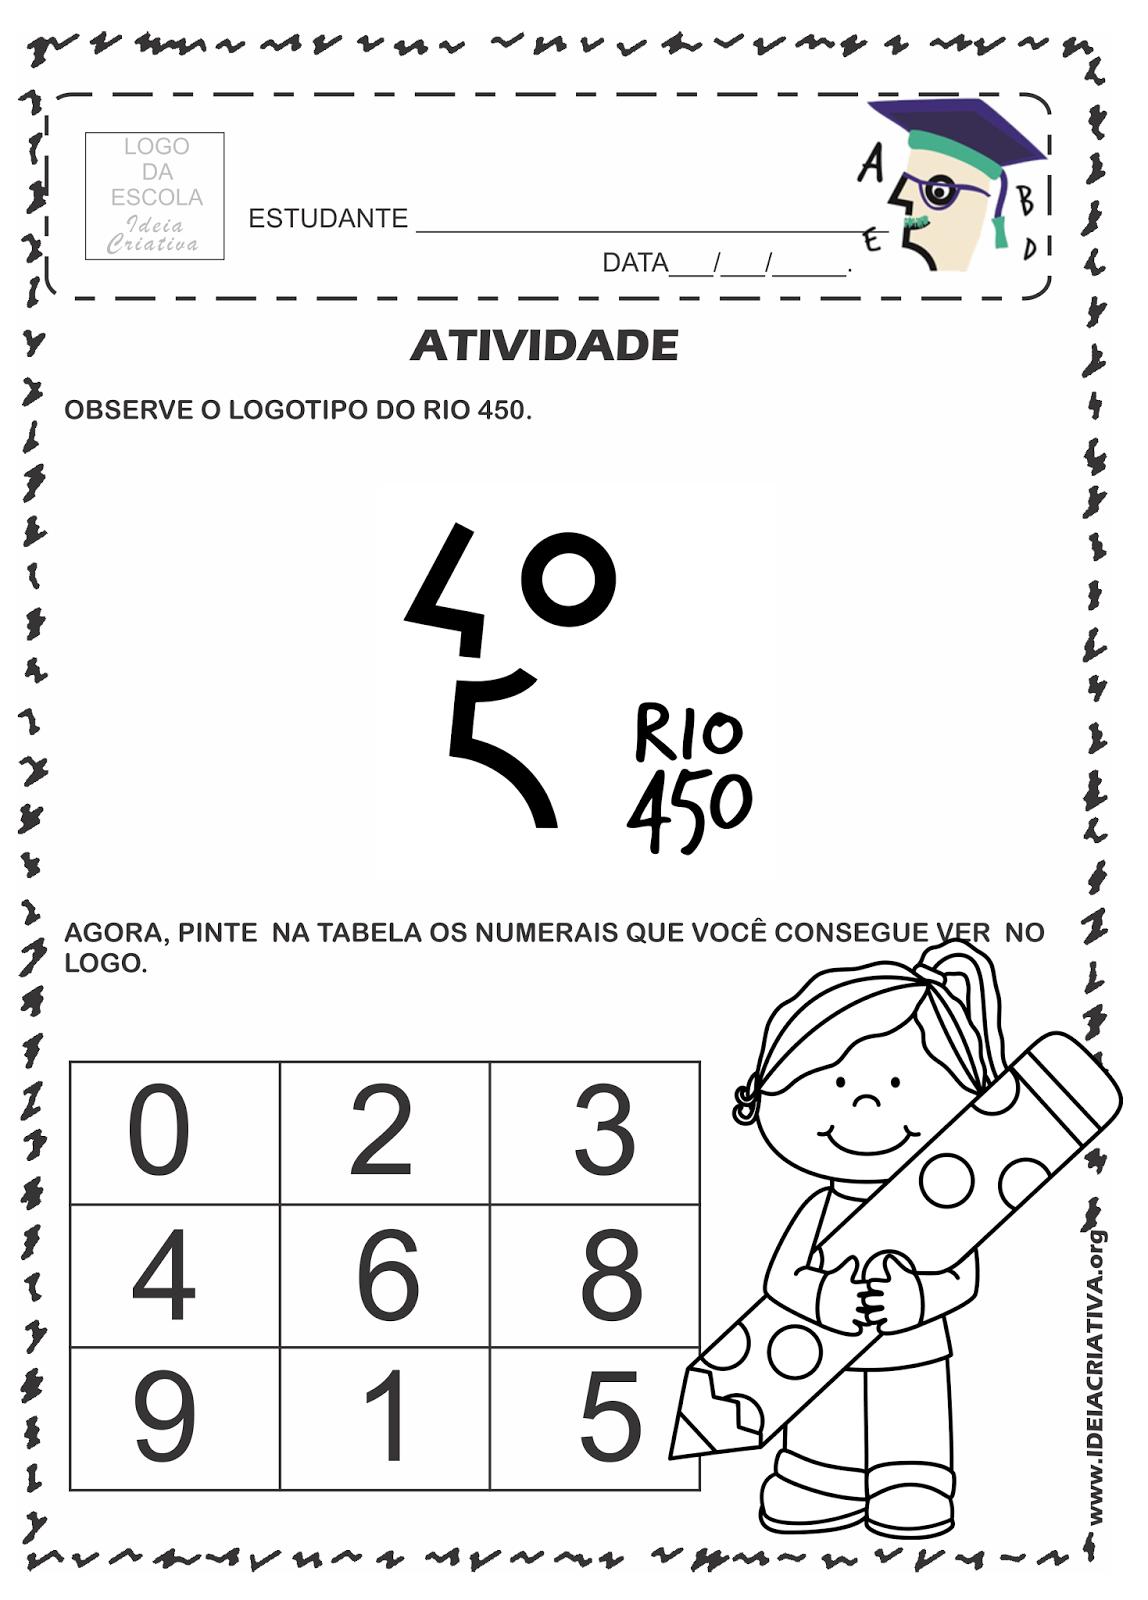 Atividade Rio 450 Anos Apreciando a Logomarca Rio 450 Anos e identificando os numerais contidos nela para posterior pintura em tabela